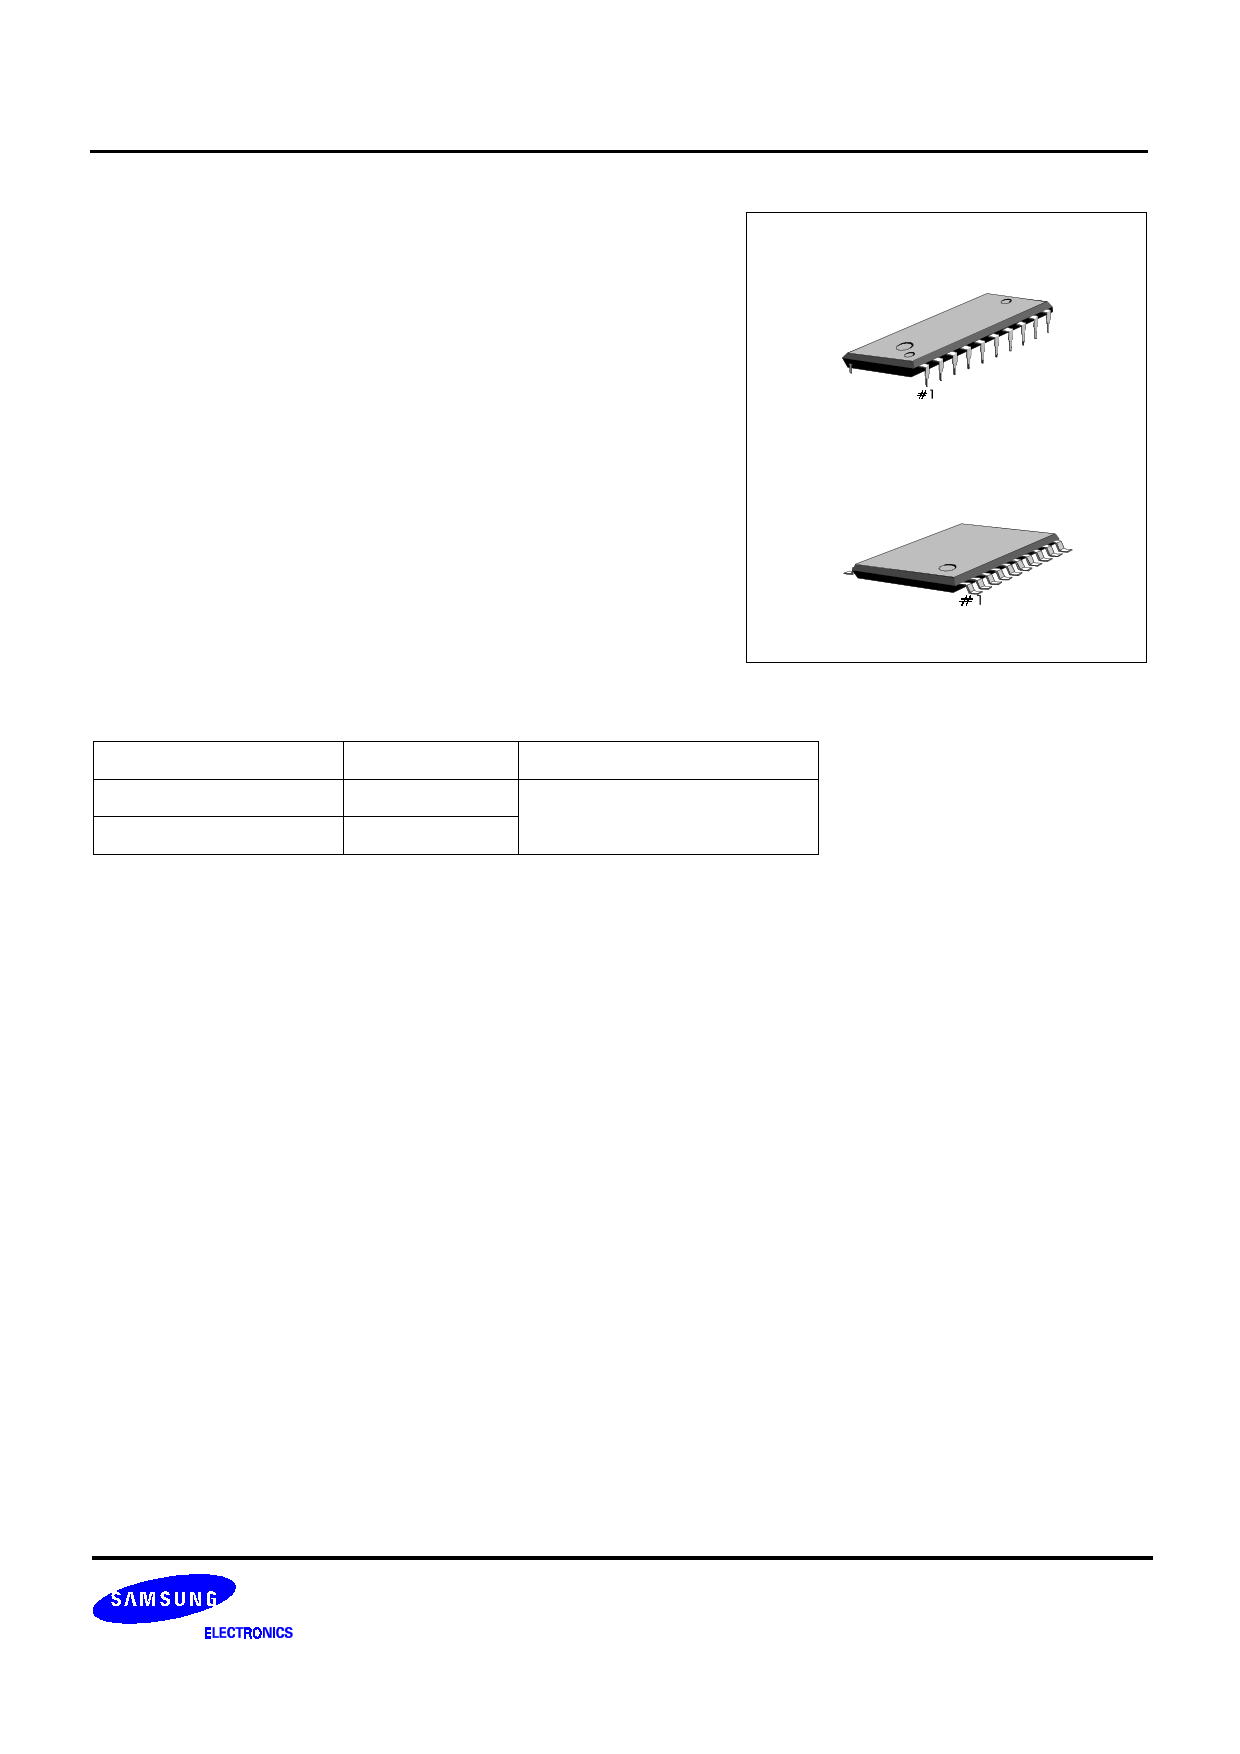 S1T8507C 데이터시트 및 S1T8507C PDF